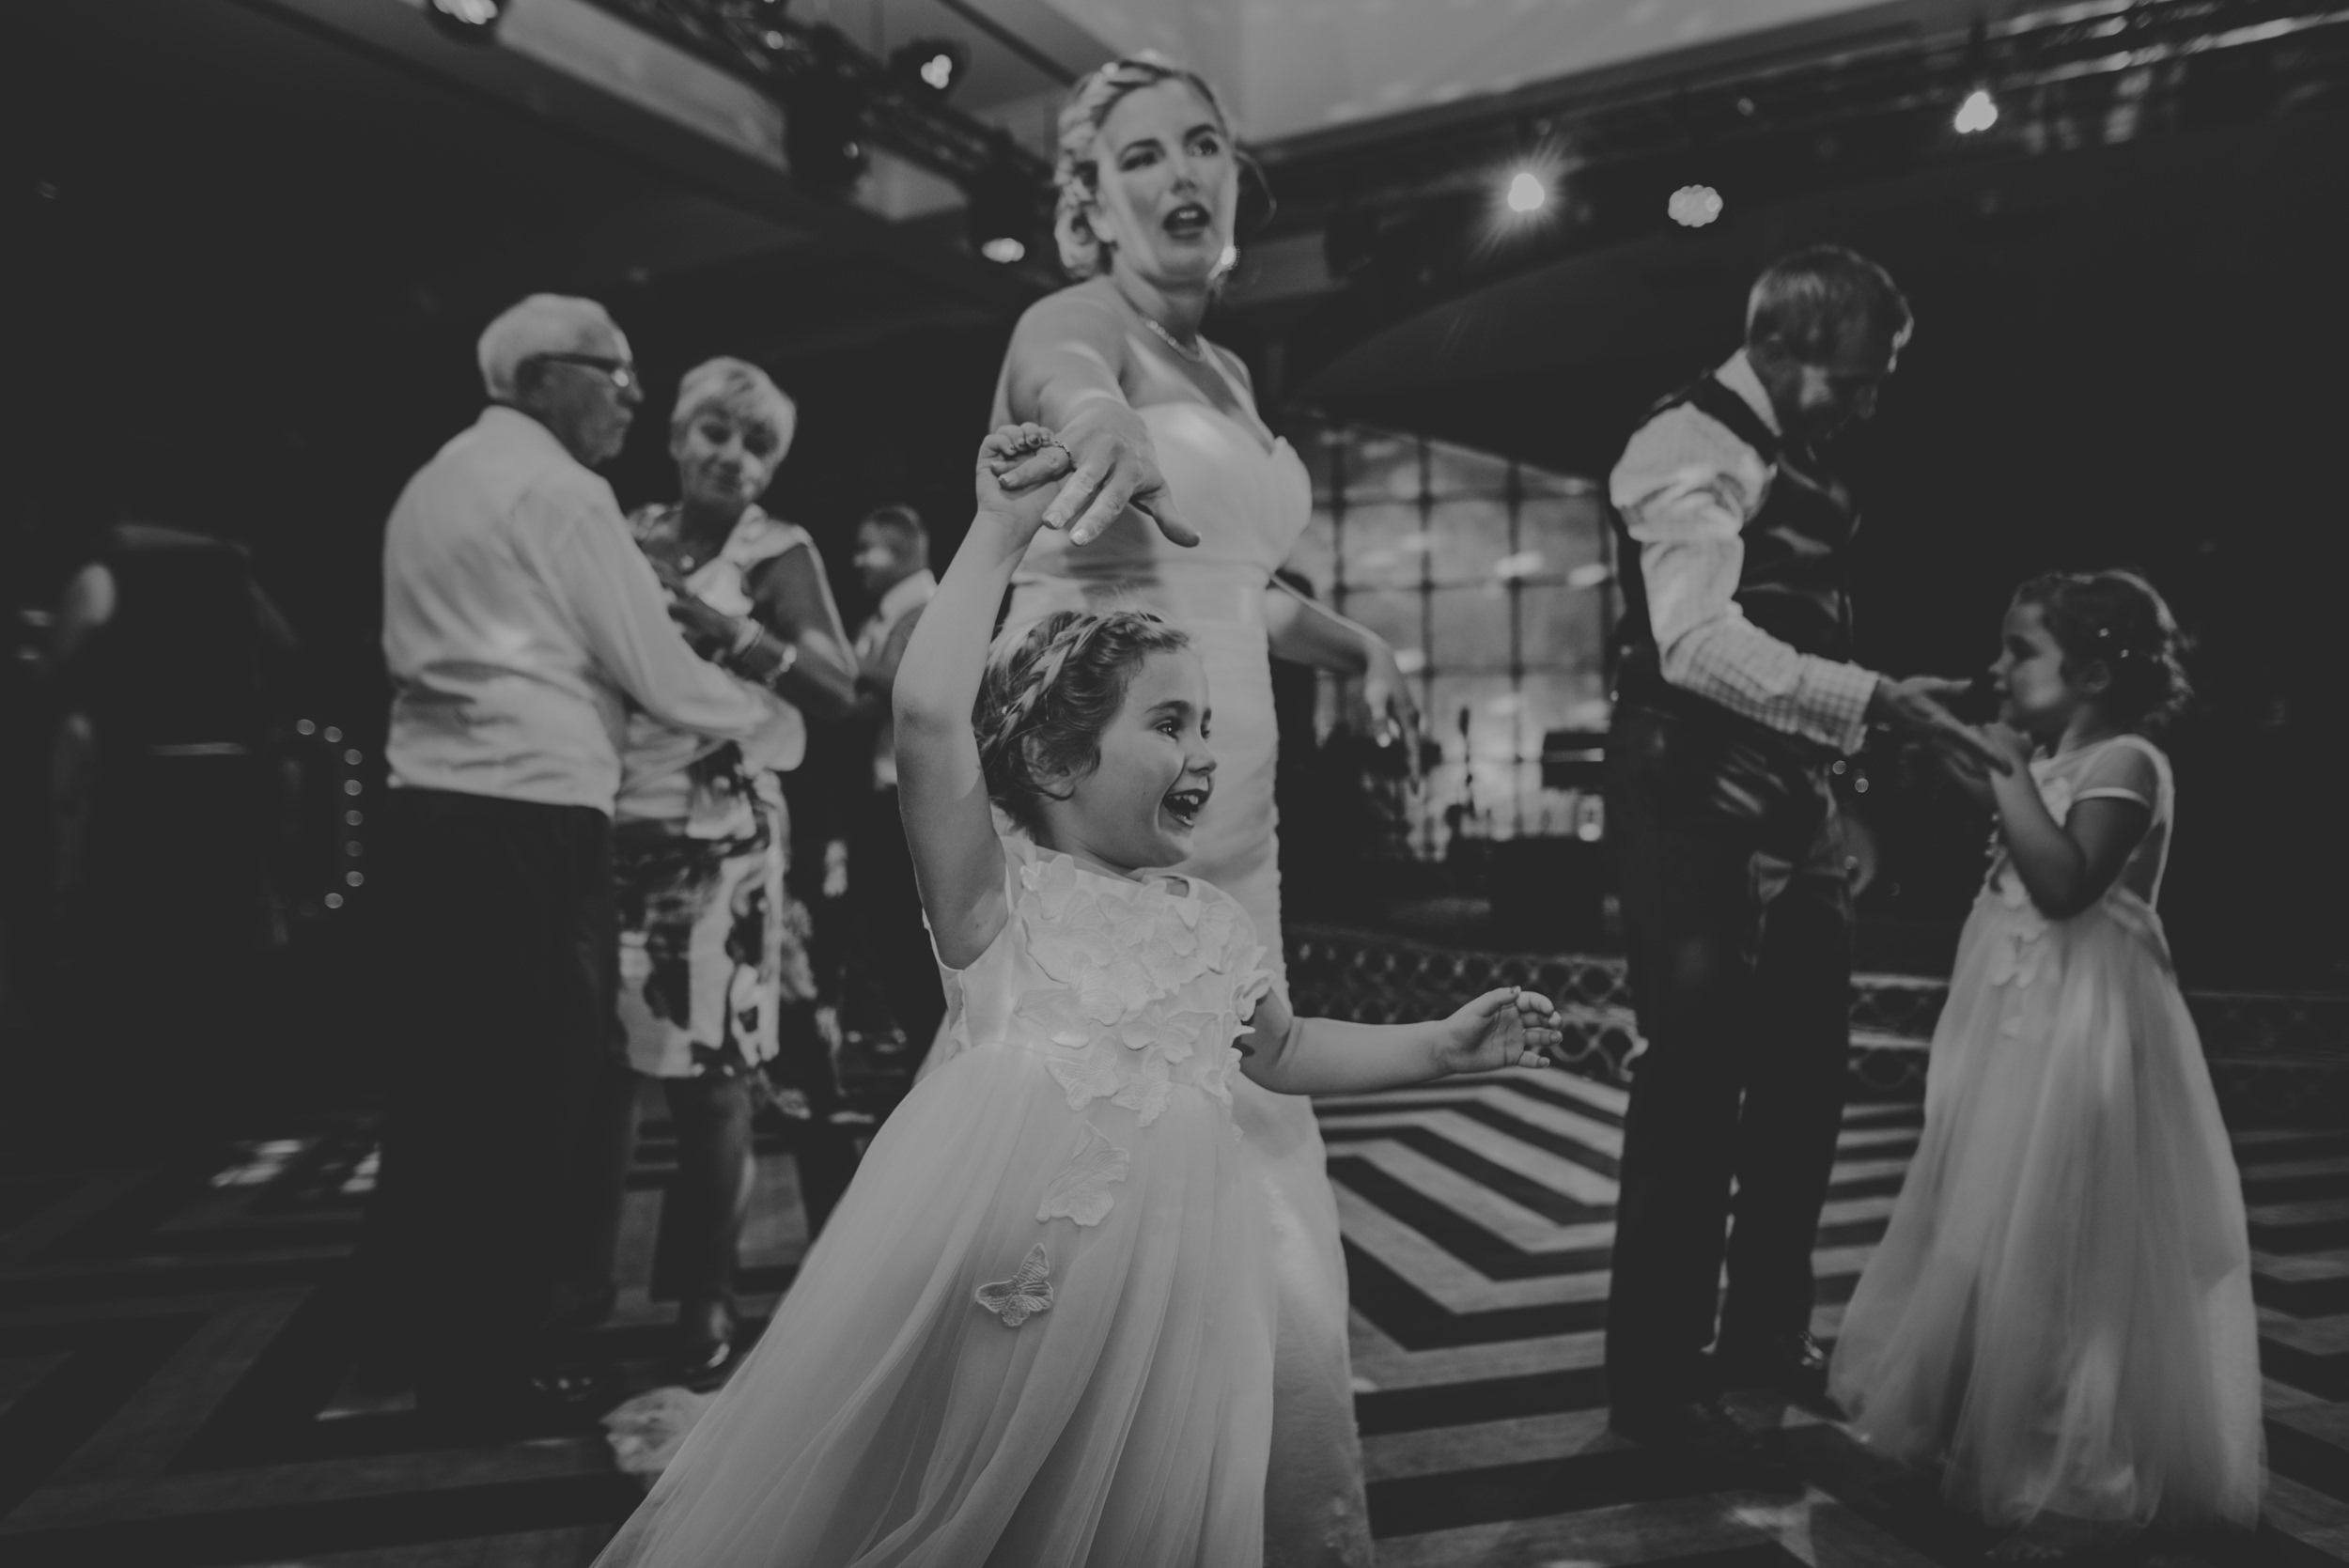 Chantelle-and-Stephen-Old-Thorns-Hotel-Wedding-Liphook-Manu-Mendoza-Wedding-Photography-565.jpg